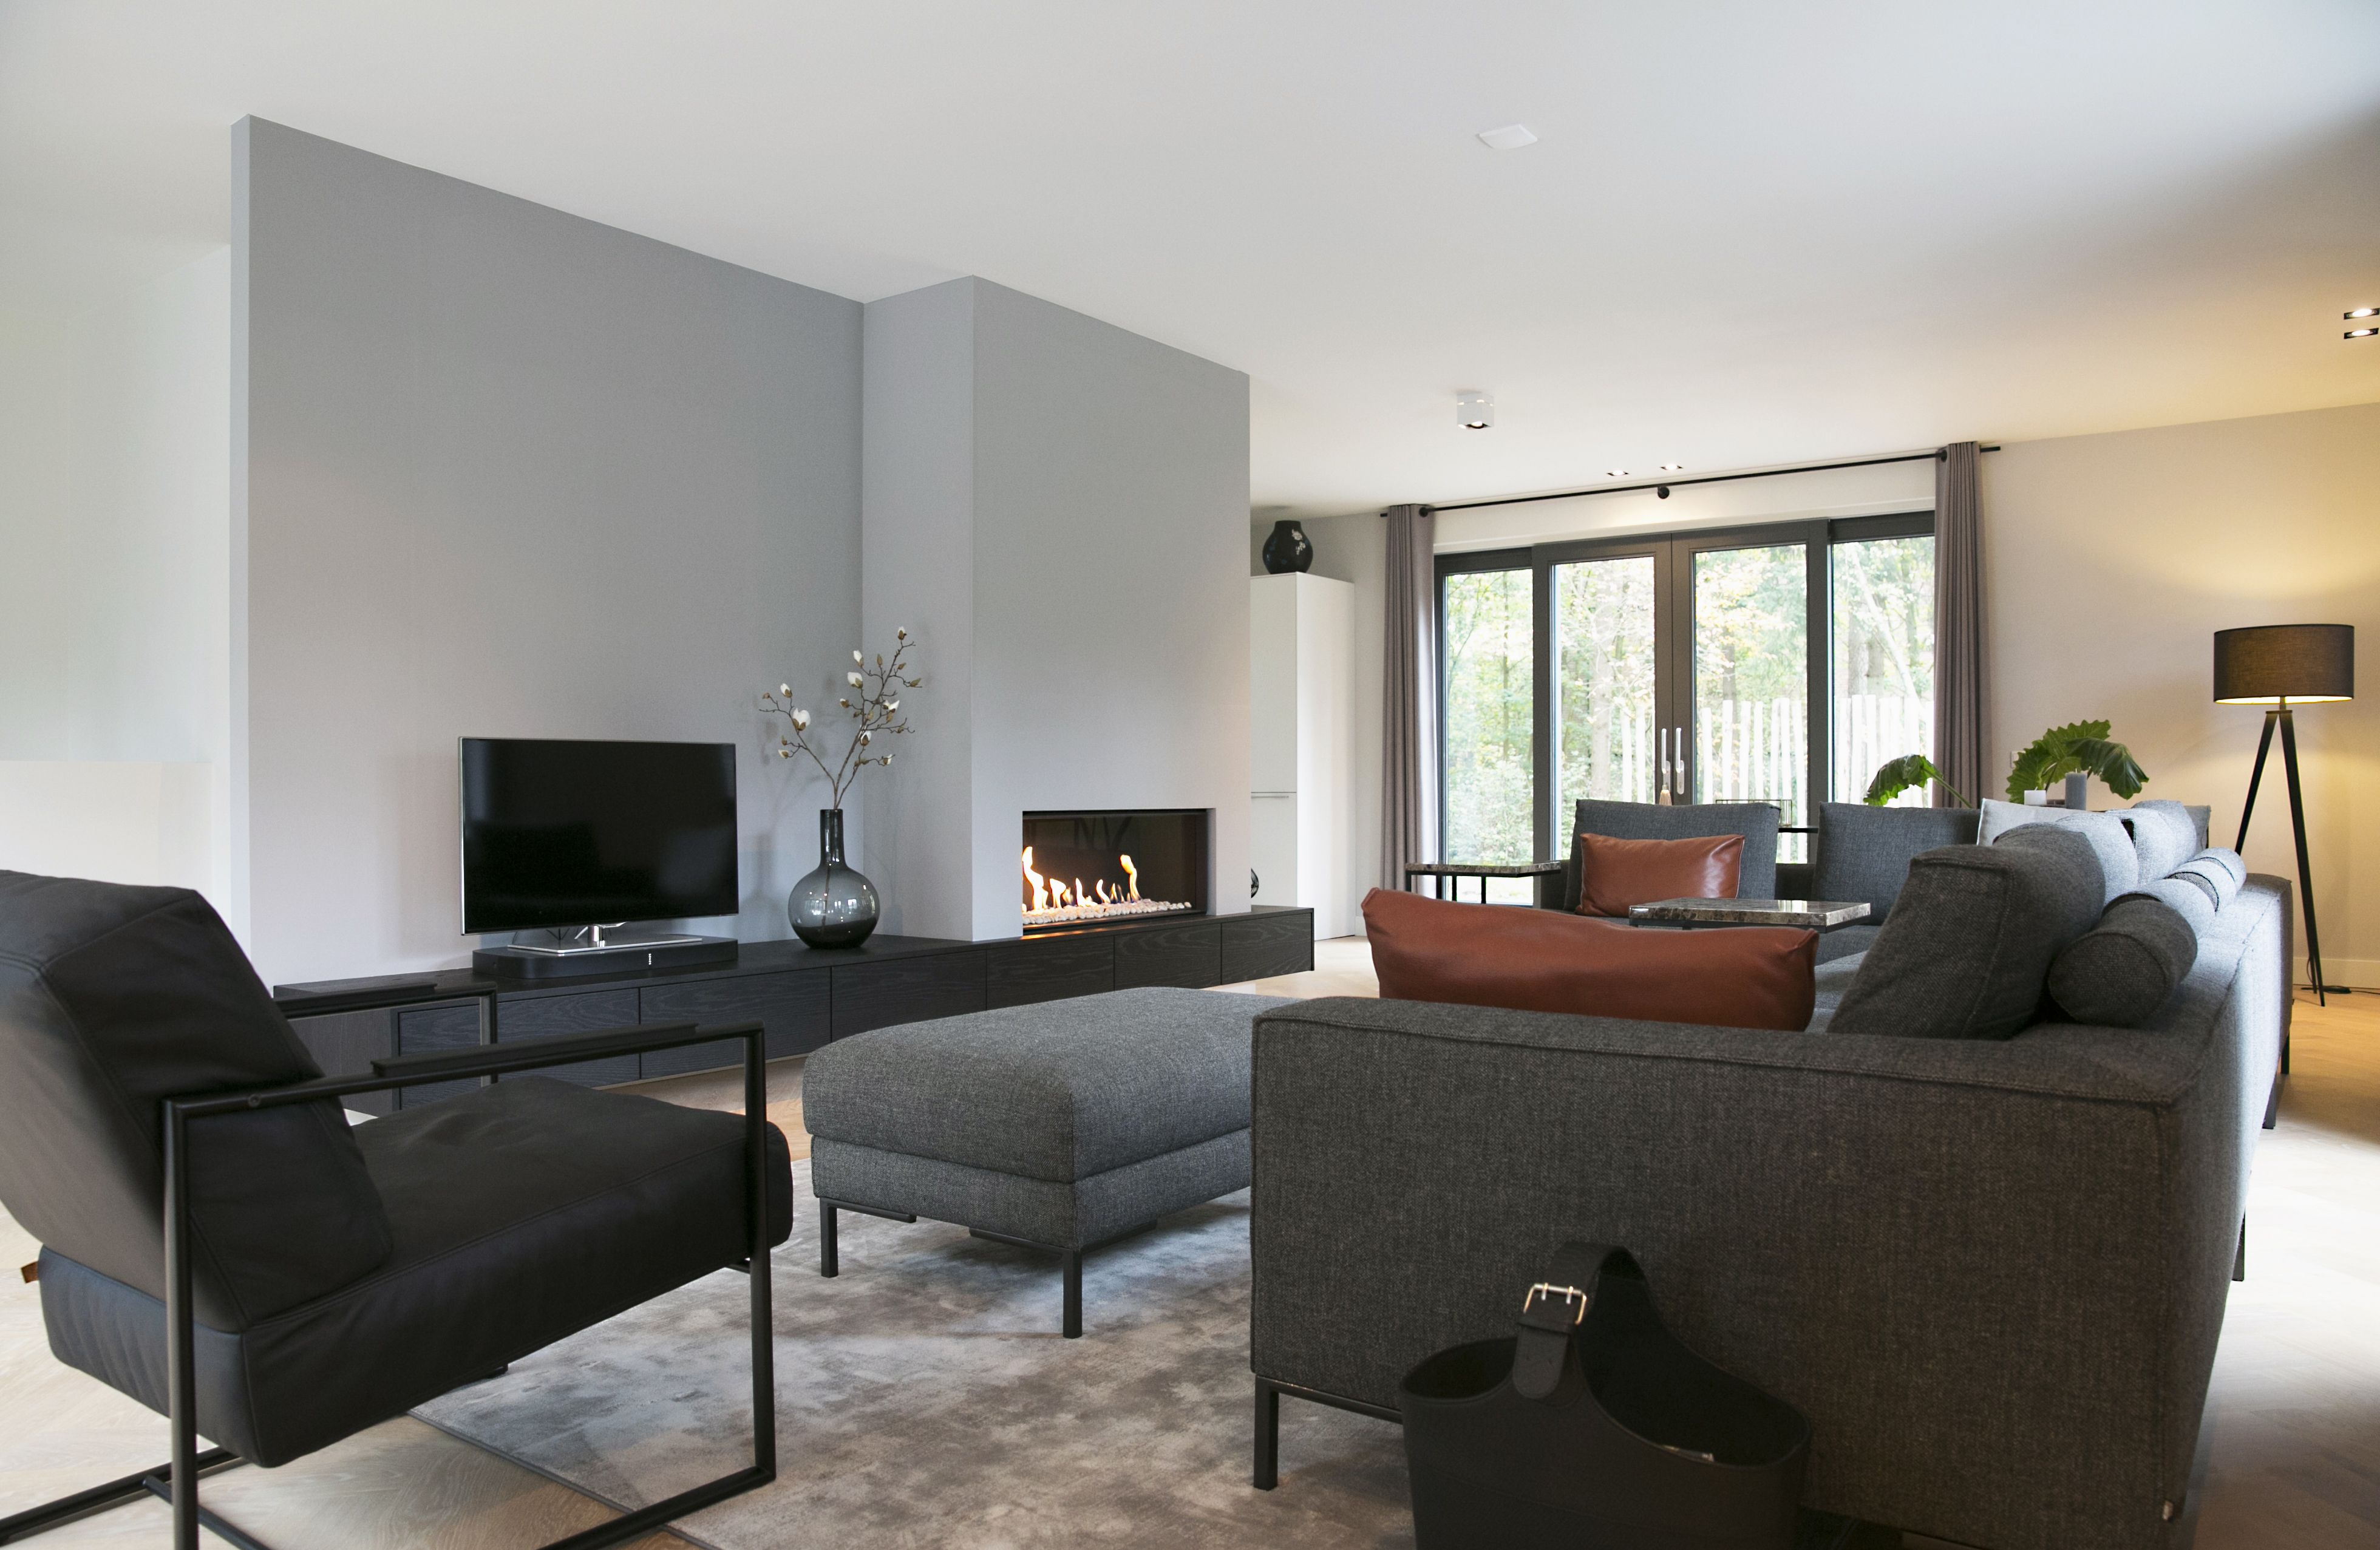 Project | Interieur design by nicole & fleur | OUR WORK ...